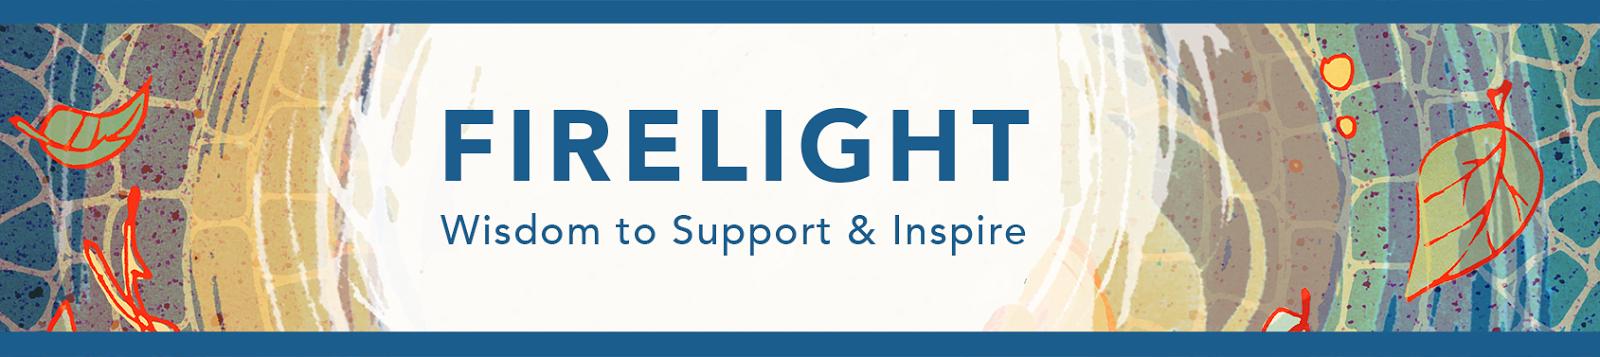 irelight-Banner.png